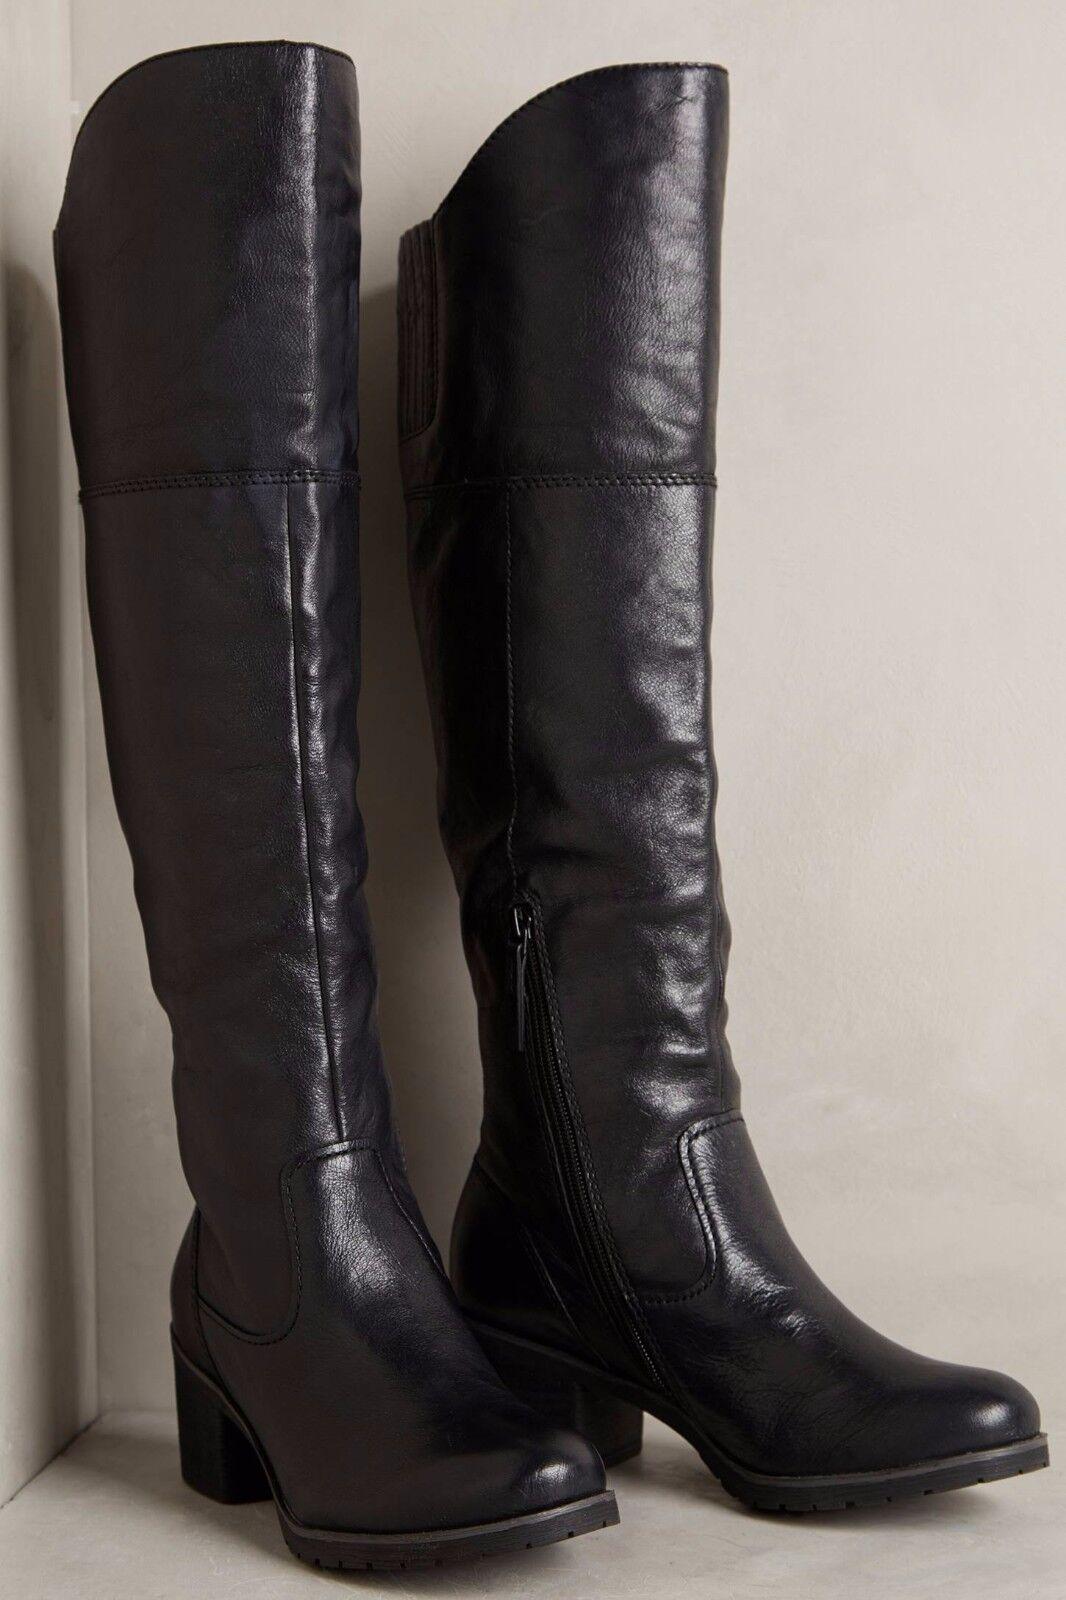 NWT Anthropologie Naya Minerve Boots by Naya 8.5